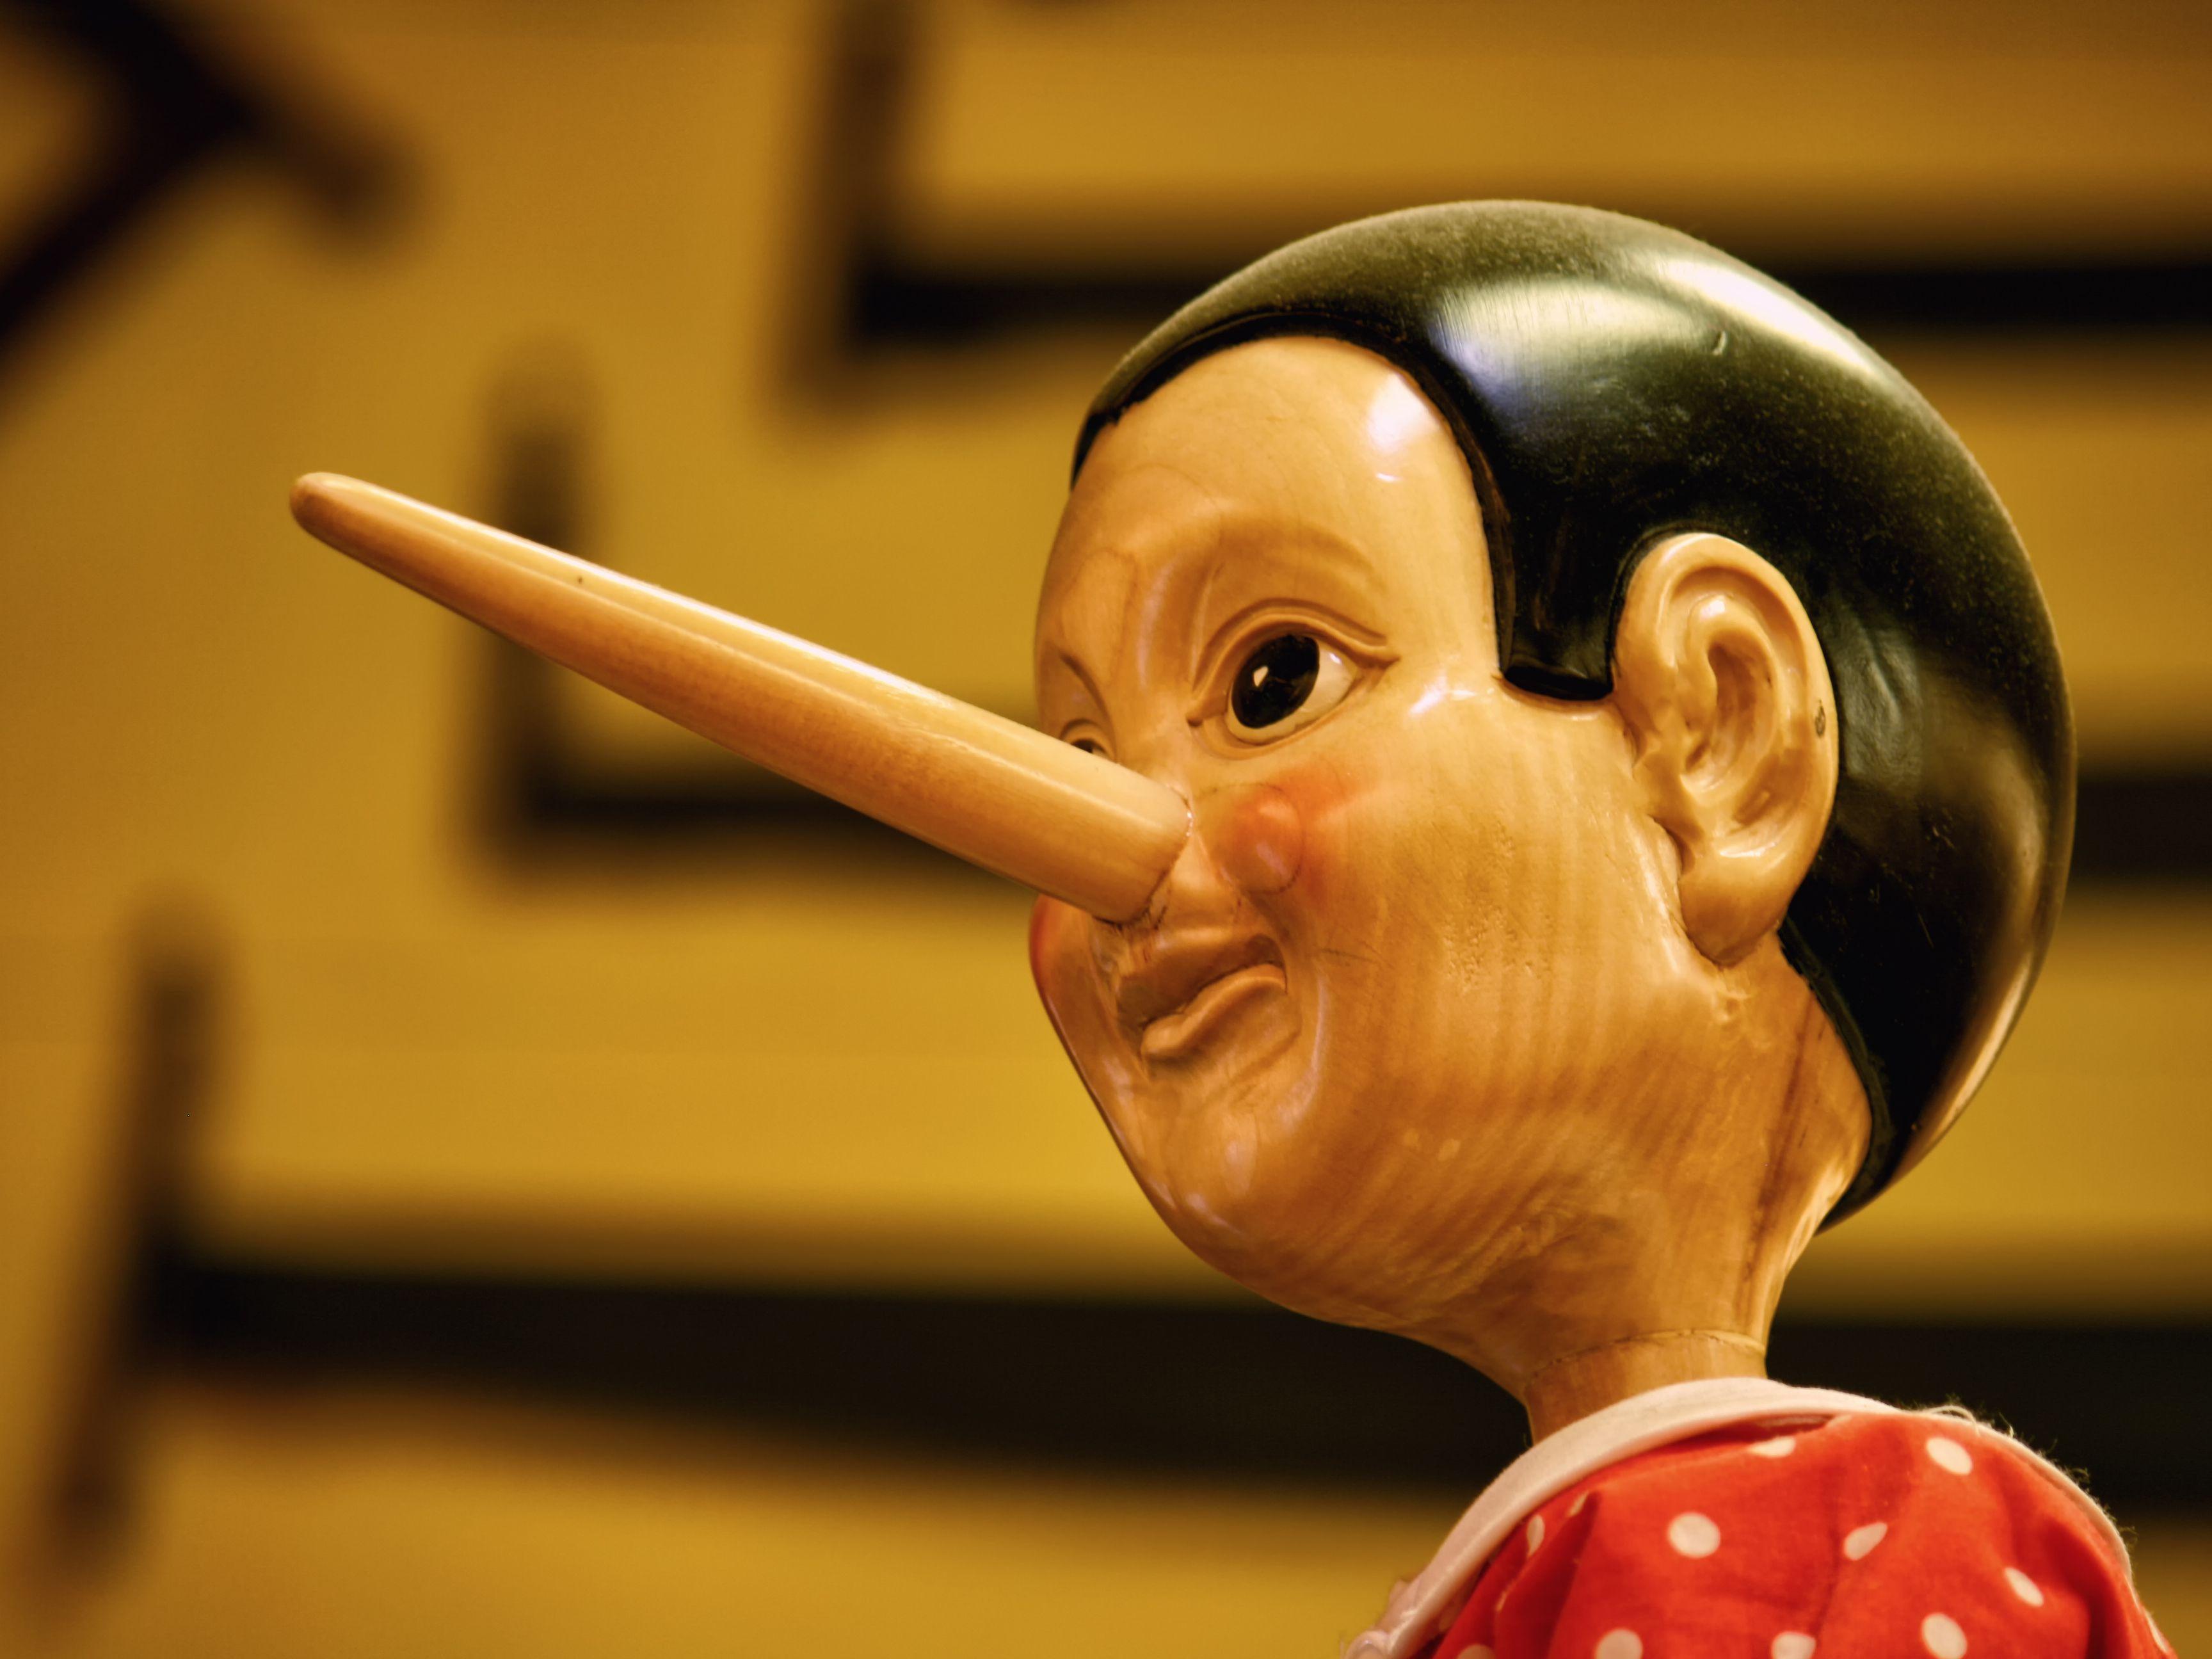 Makes a liar what pathological Pathological liars: